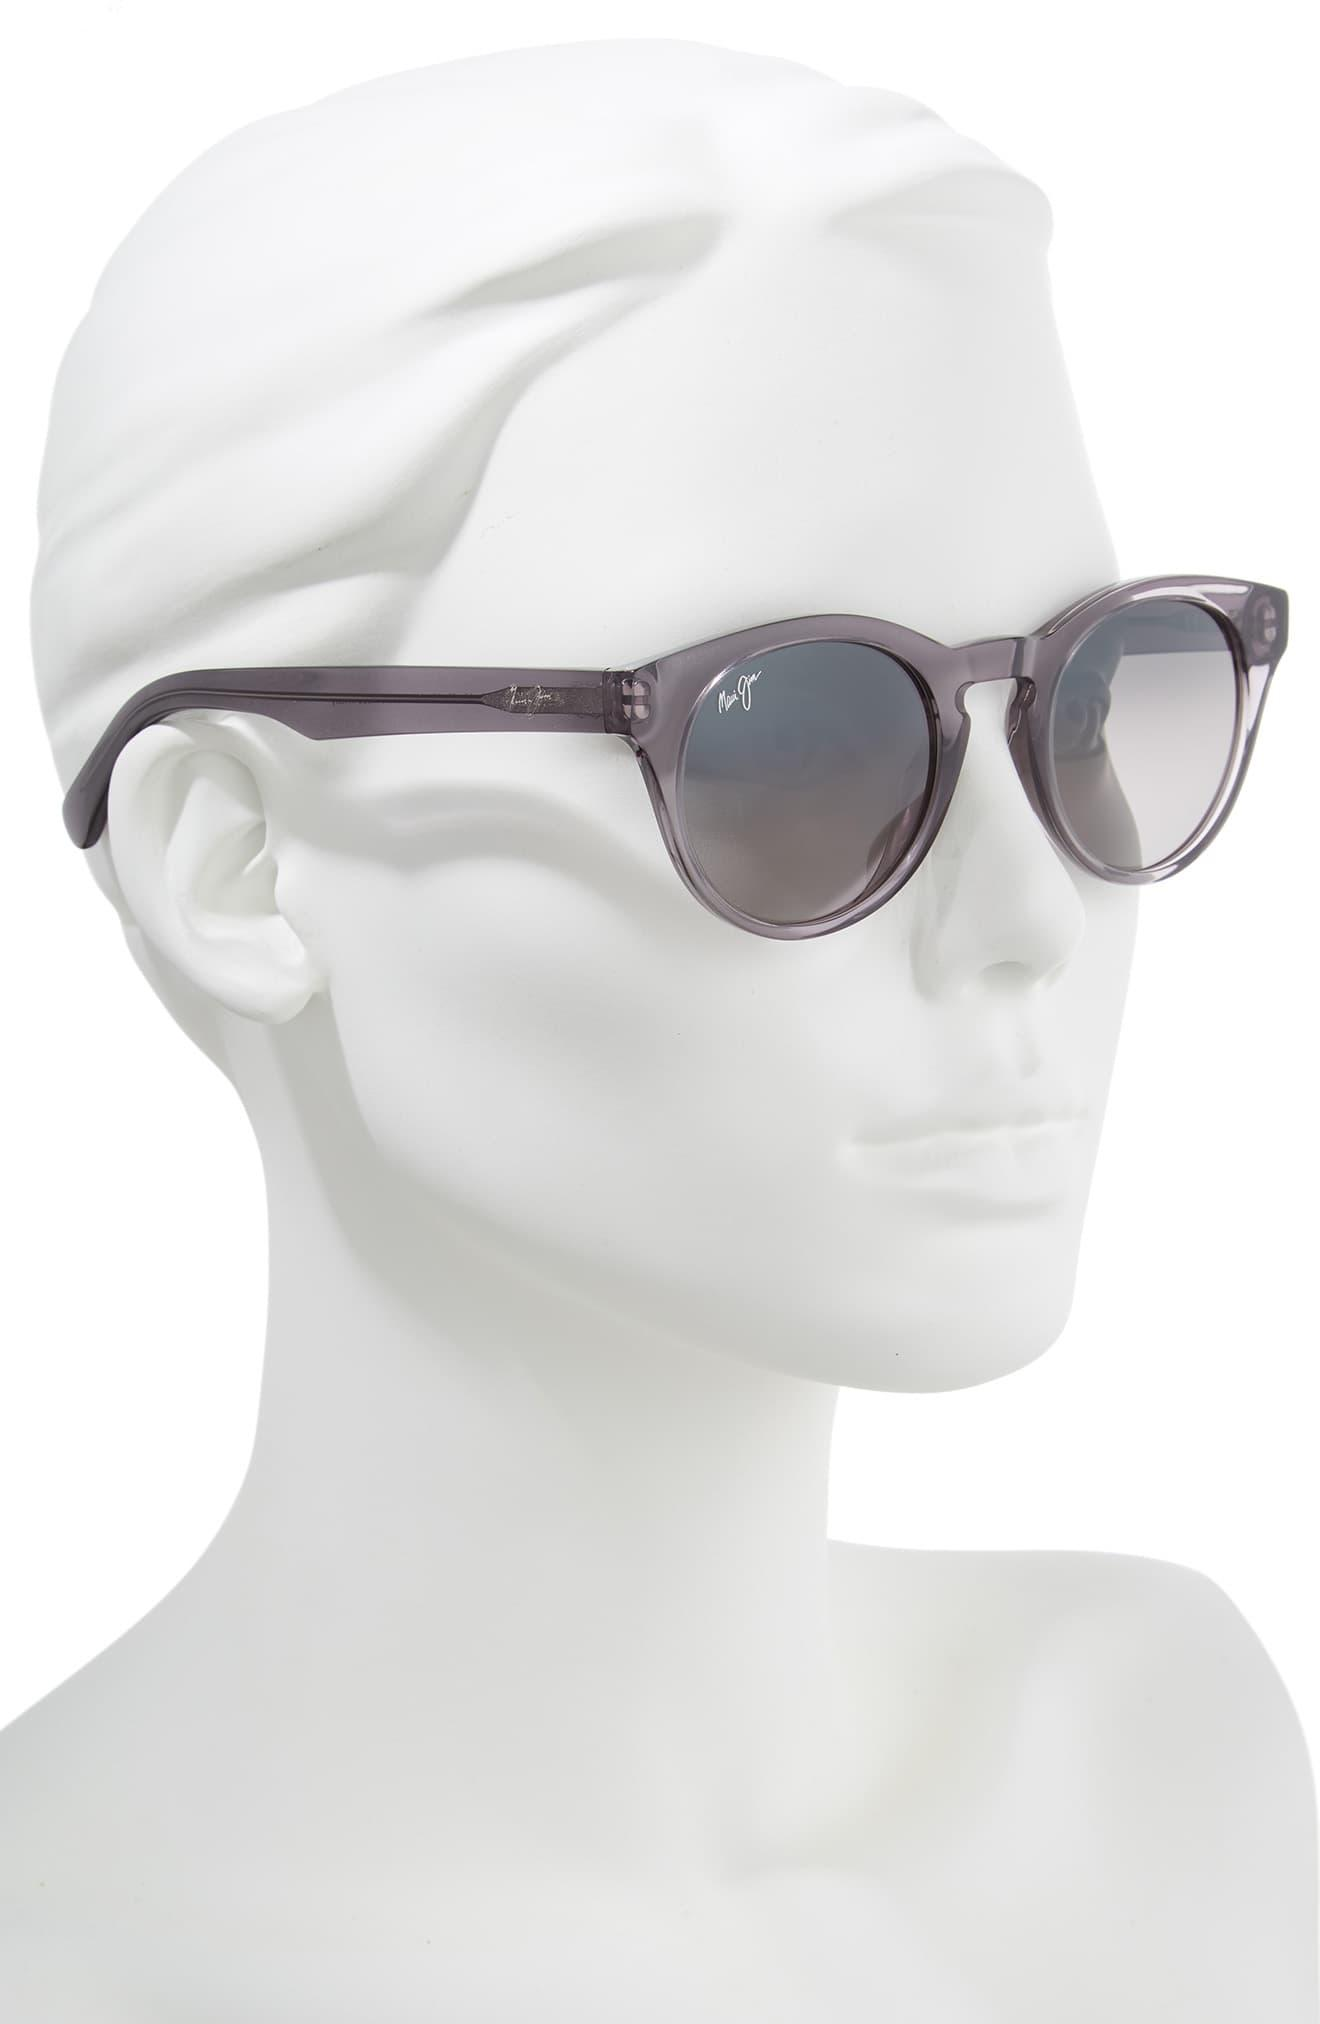 e3cb726946fd Maui Jim - Gray Dragonfly 49mm Polarized Cat Eye Sunglasses - Translucent  Grey/ Neutral Grey. View fullscreen